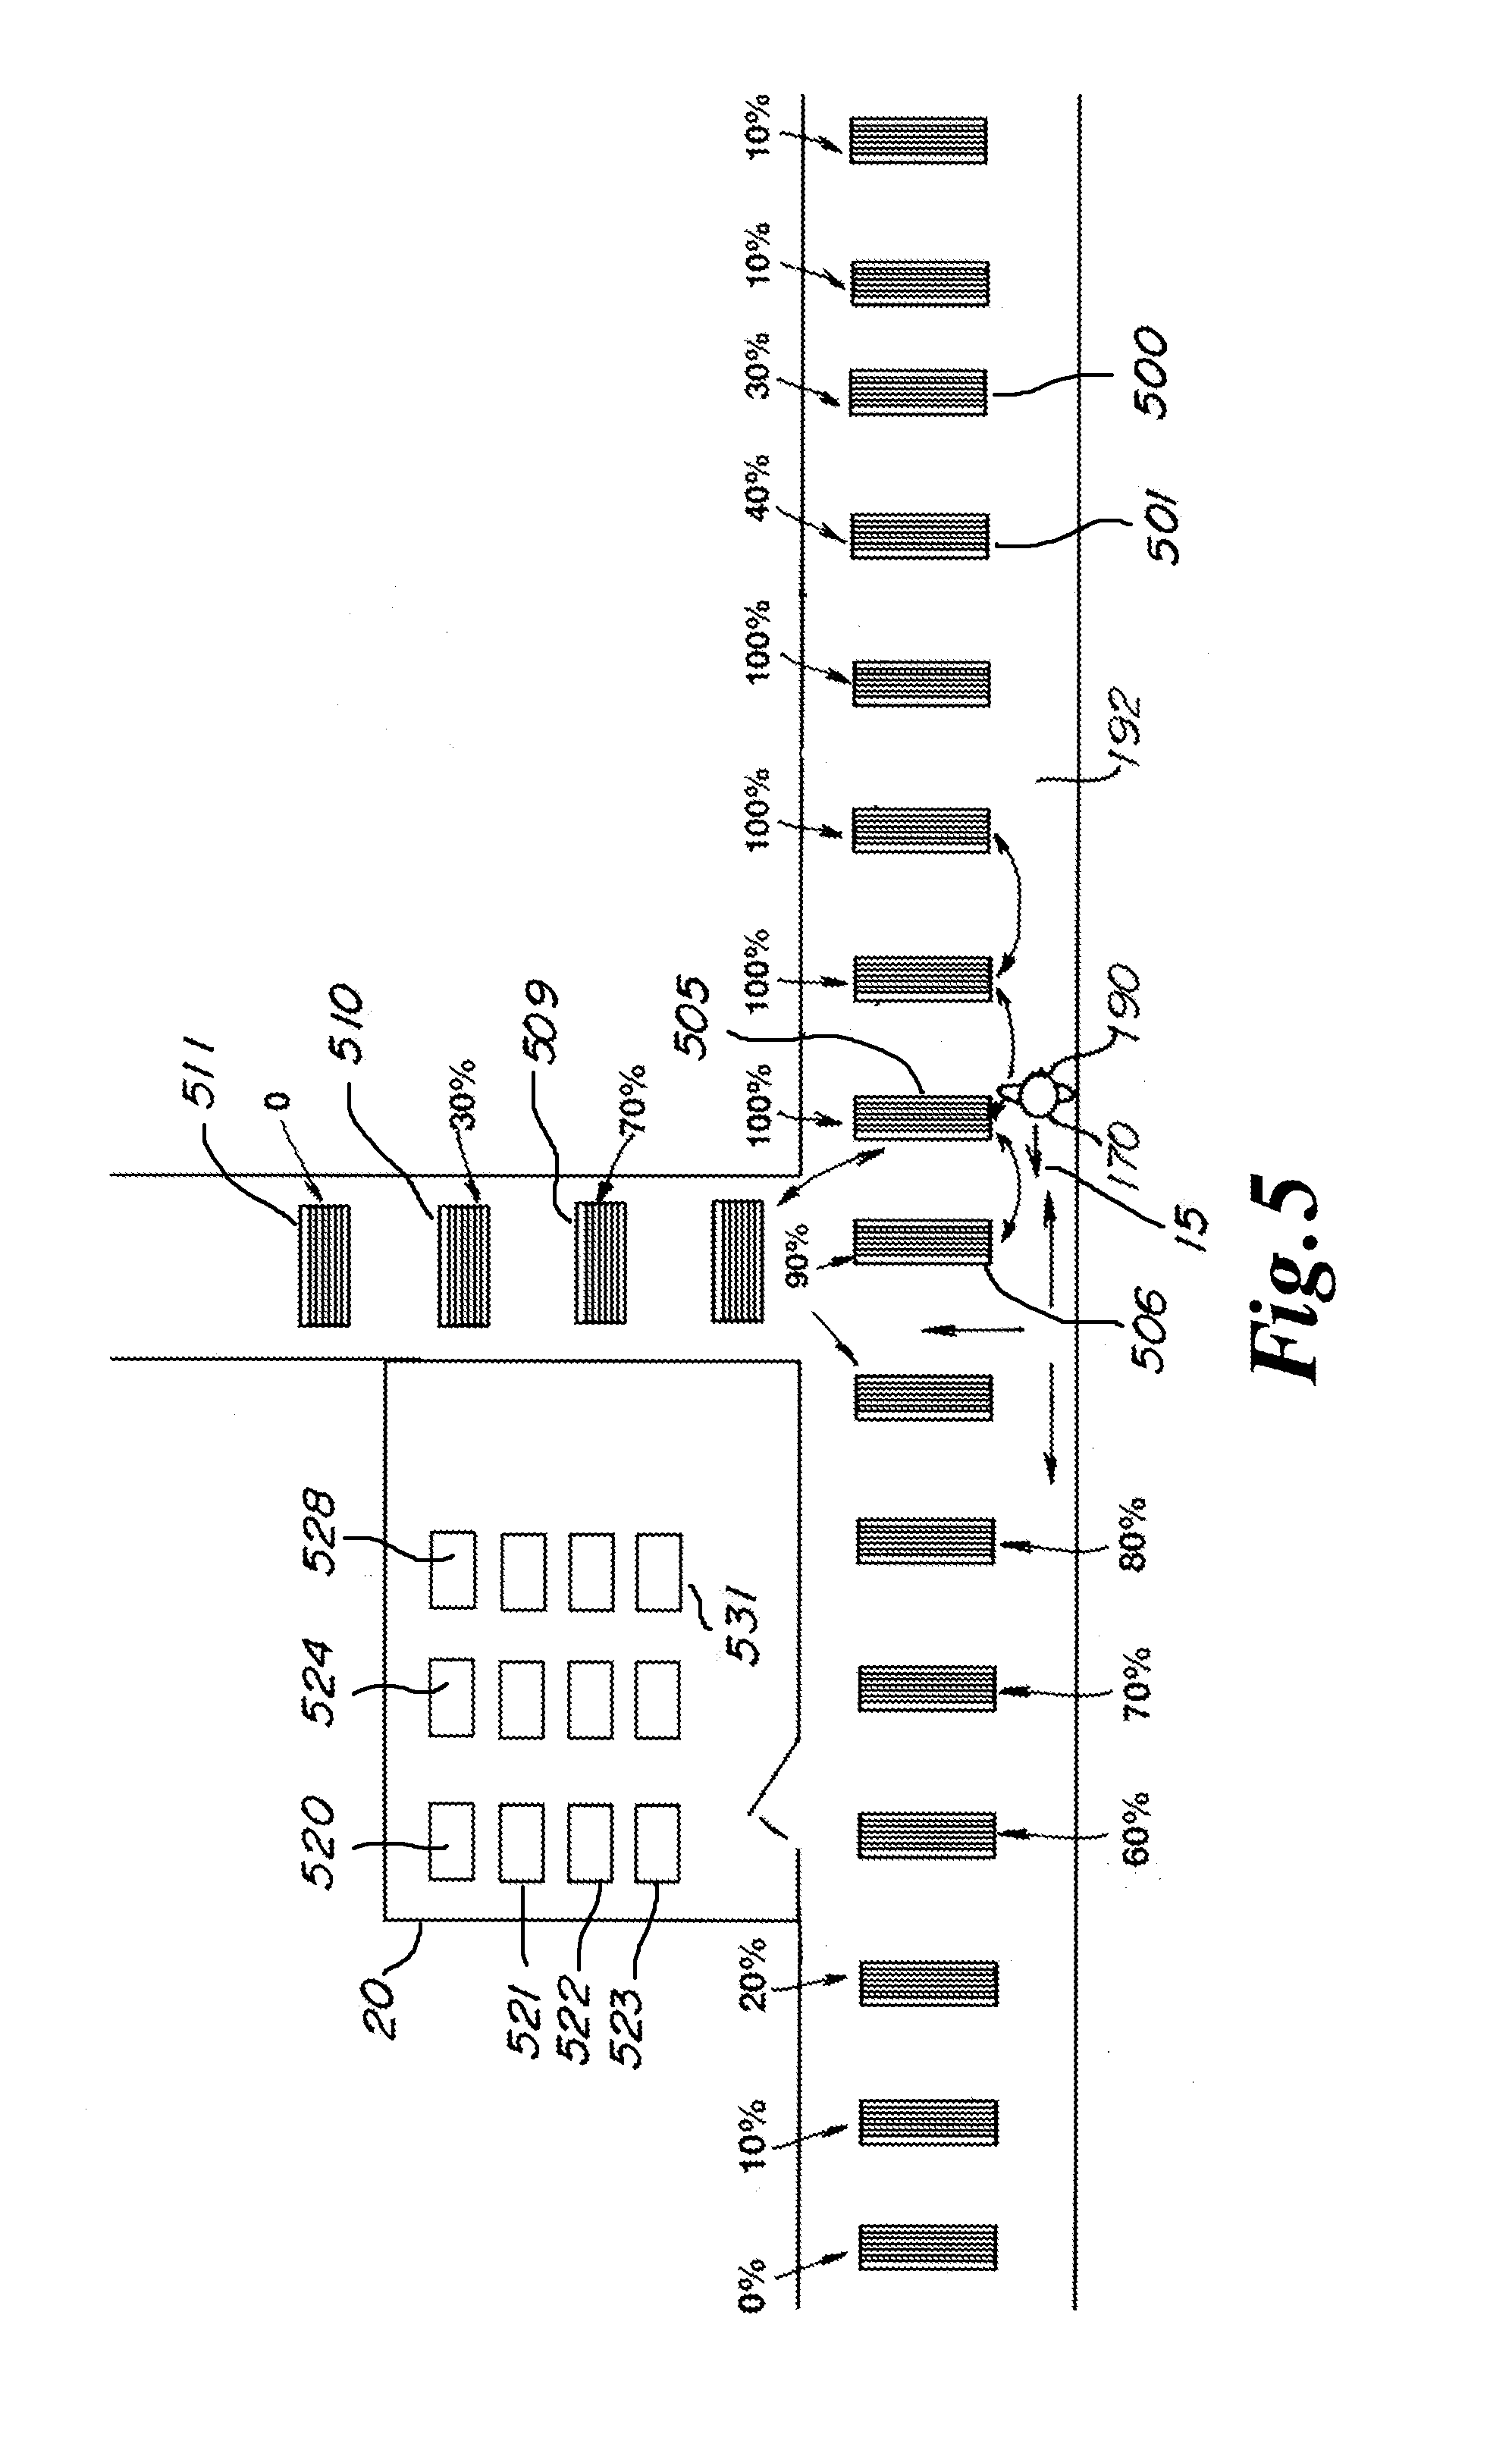 Patent Us 9265112 B2 Seethrough Sensor Circuit Diagram Tradeoficcom